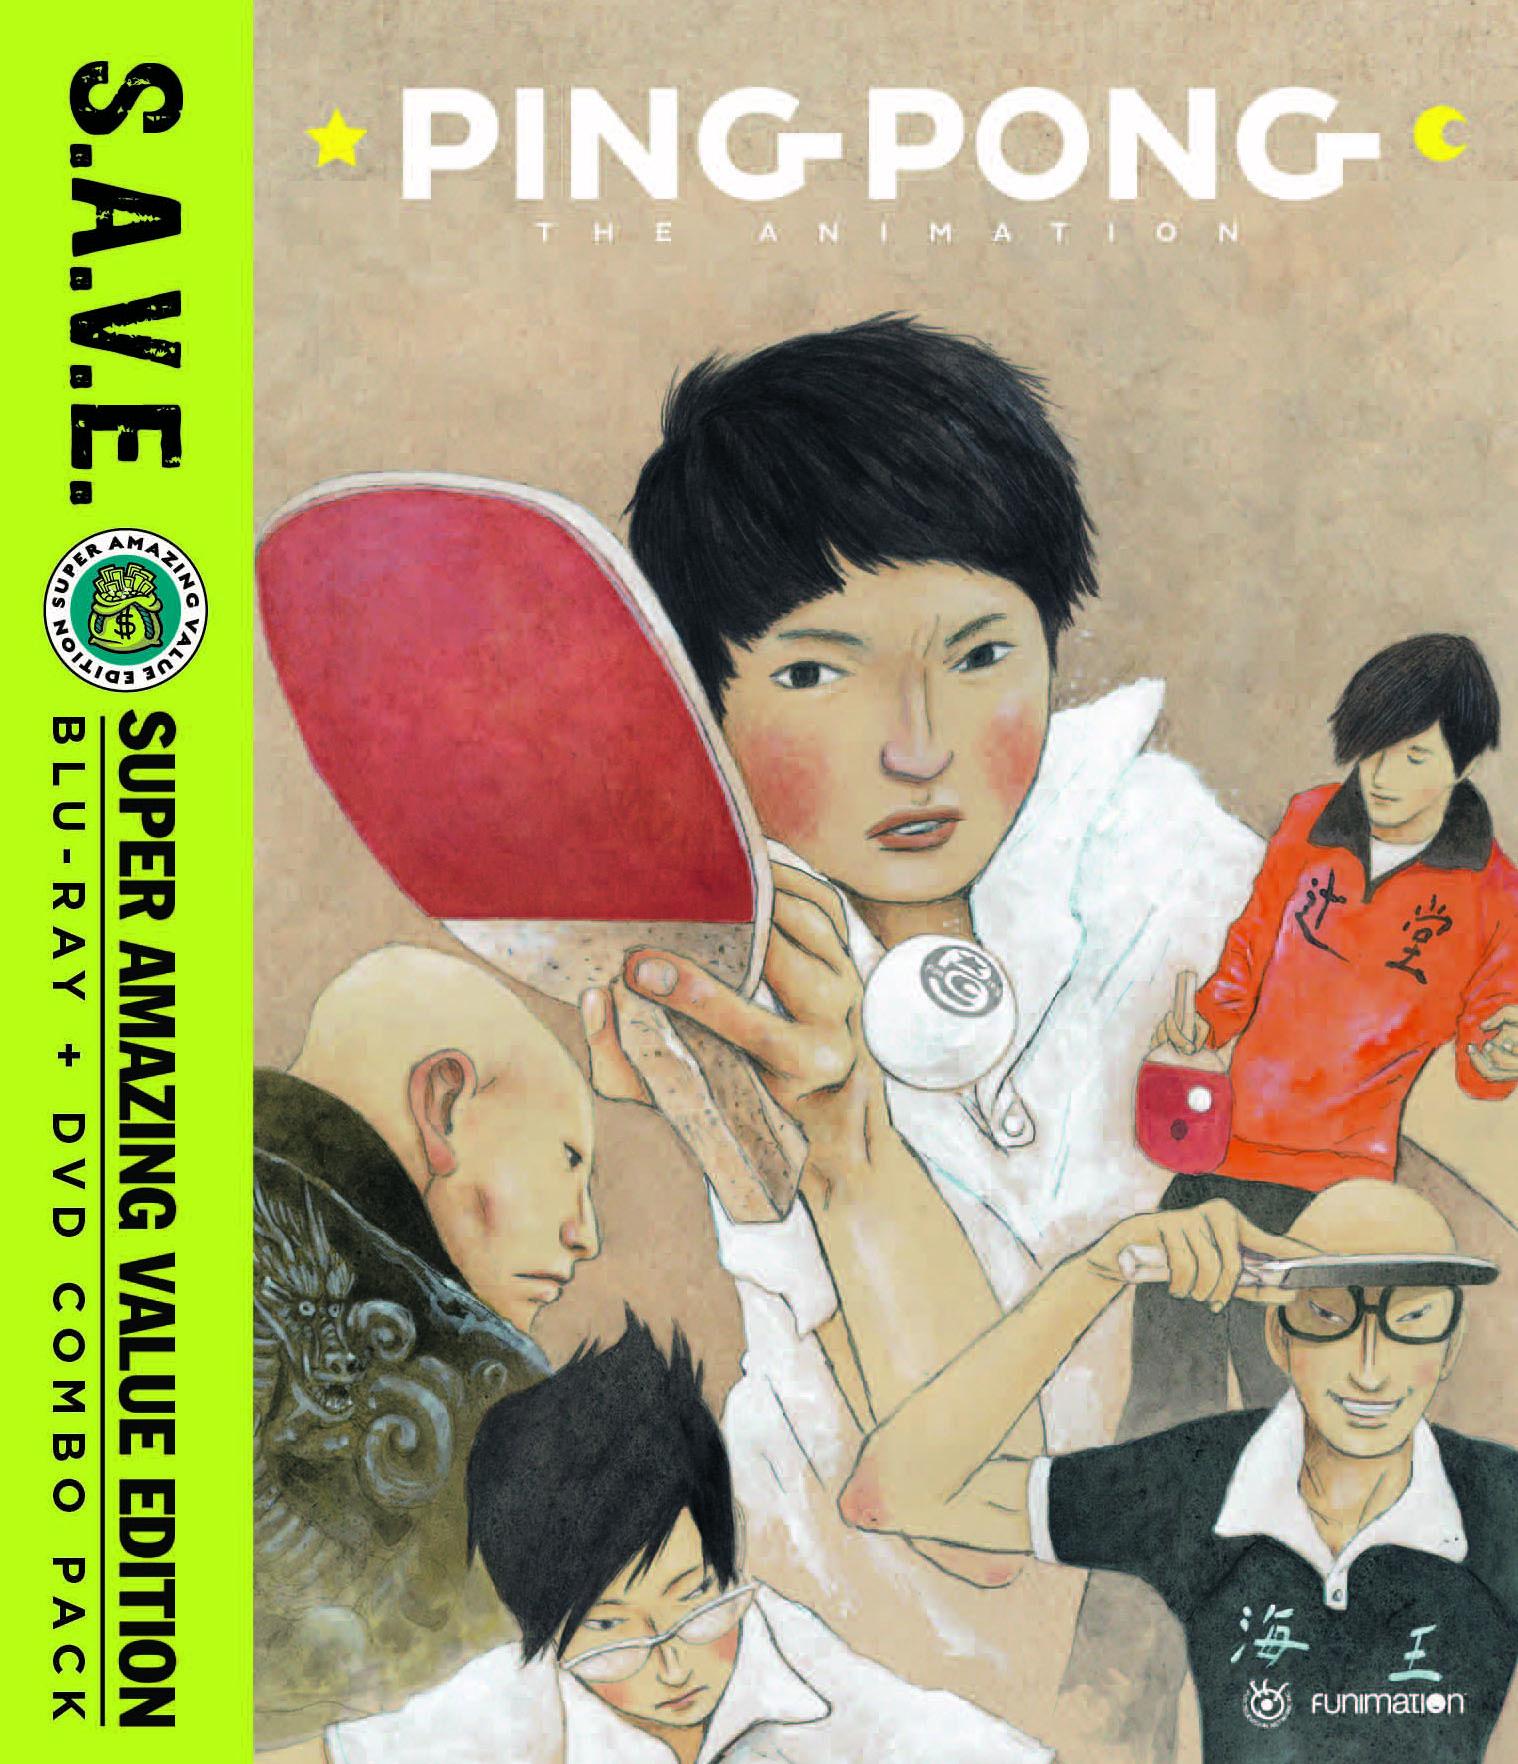 Ping Pong Blu-ray/DVD SAVE Edition